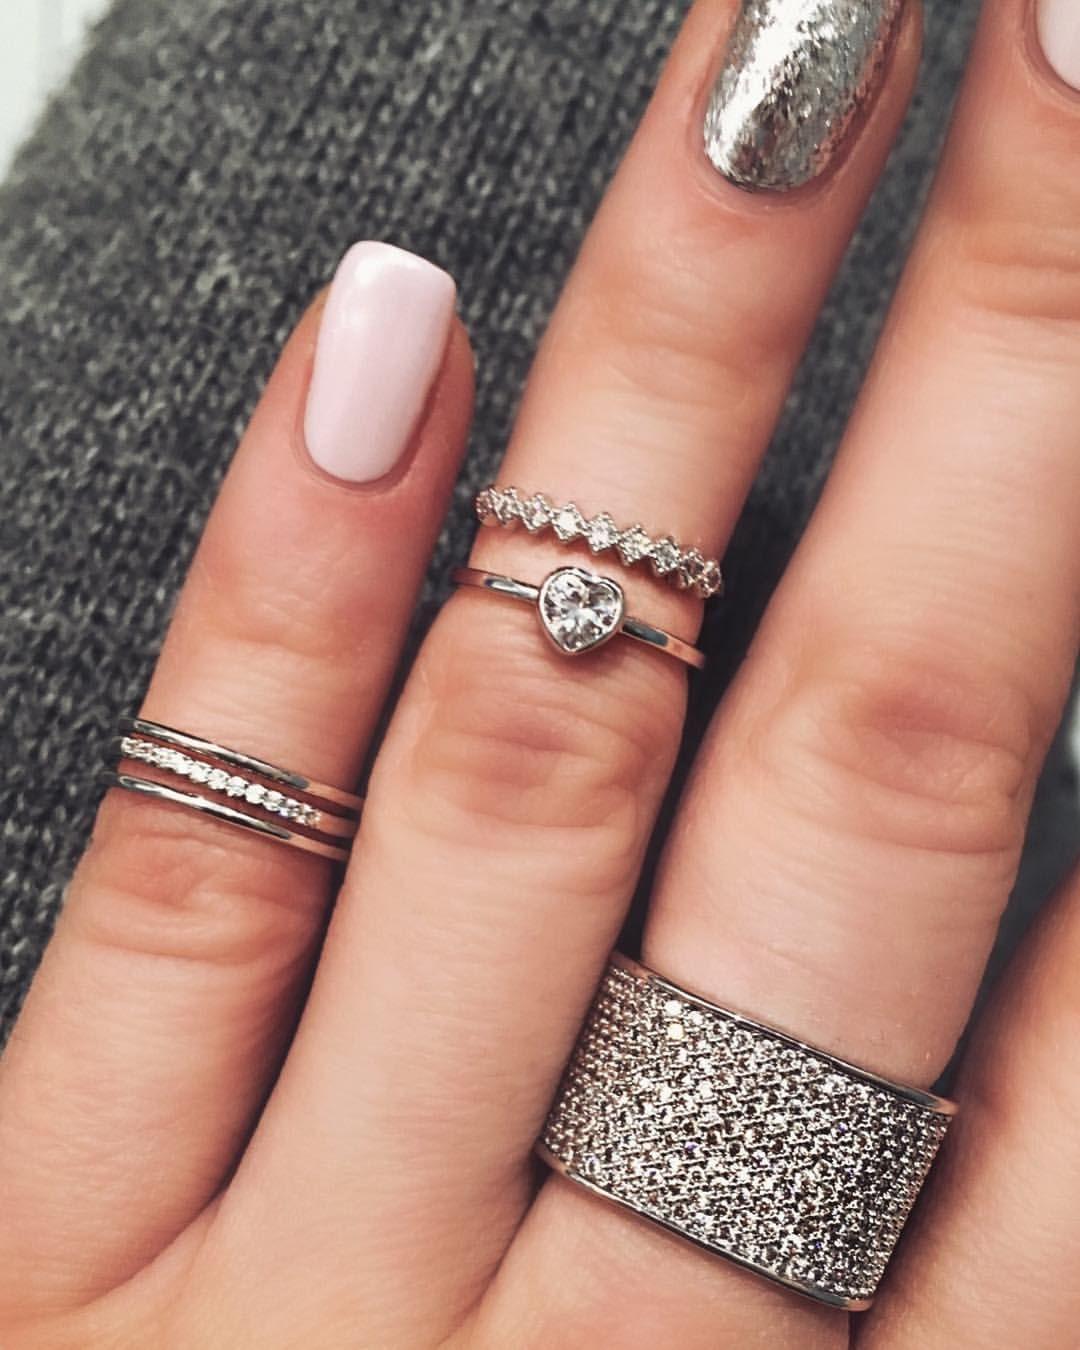 Кольцо на фалангу своими руками фото 854